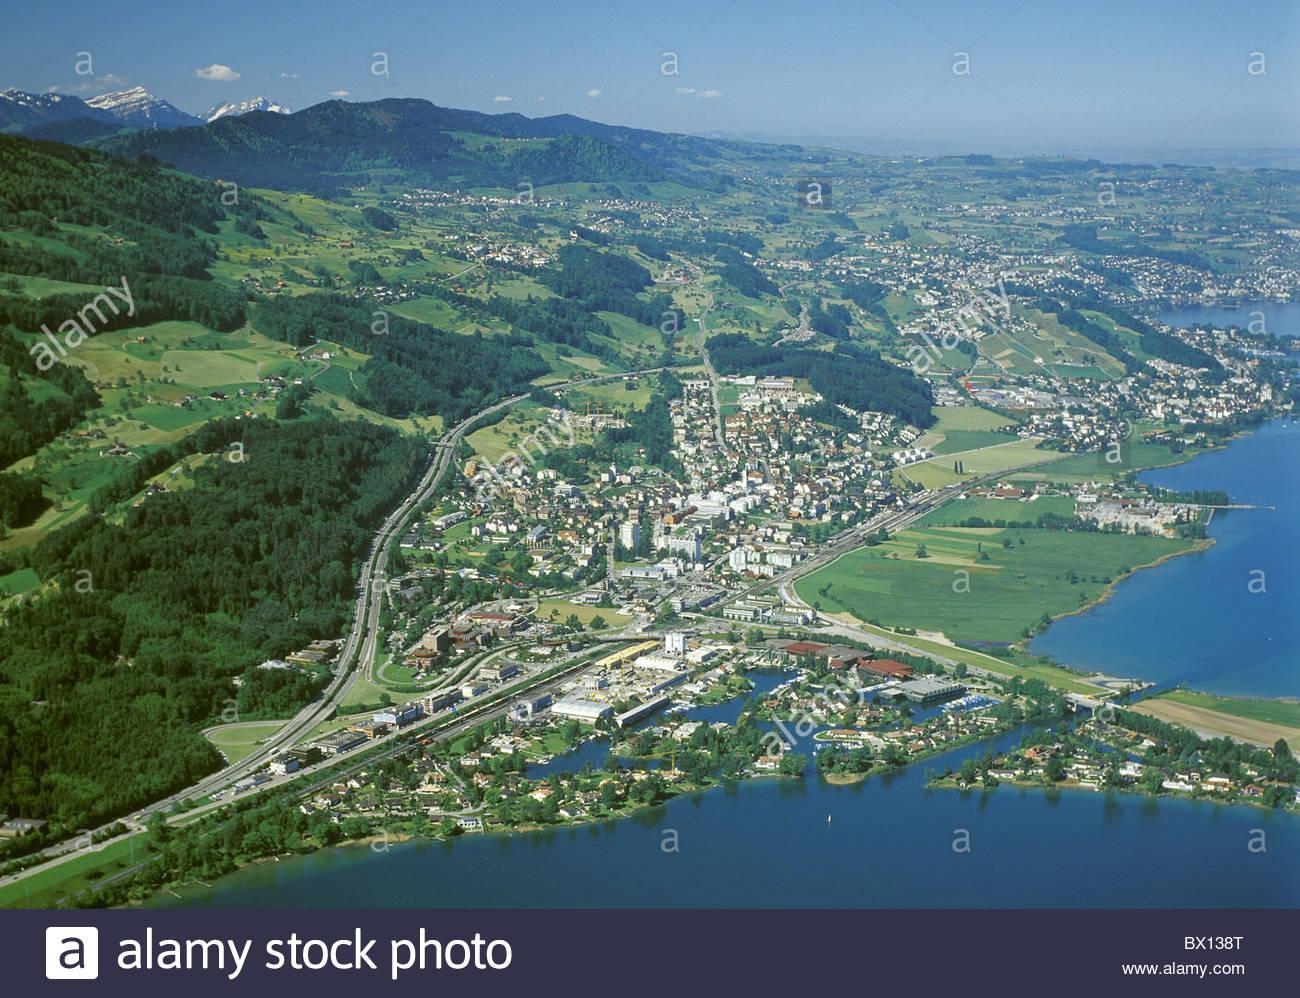 Aerial photo canton schwyz dam hill lake lake dam obersee for Innendekoration pfaffikon zh